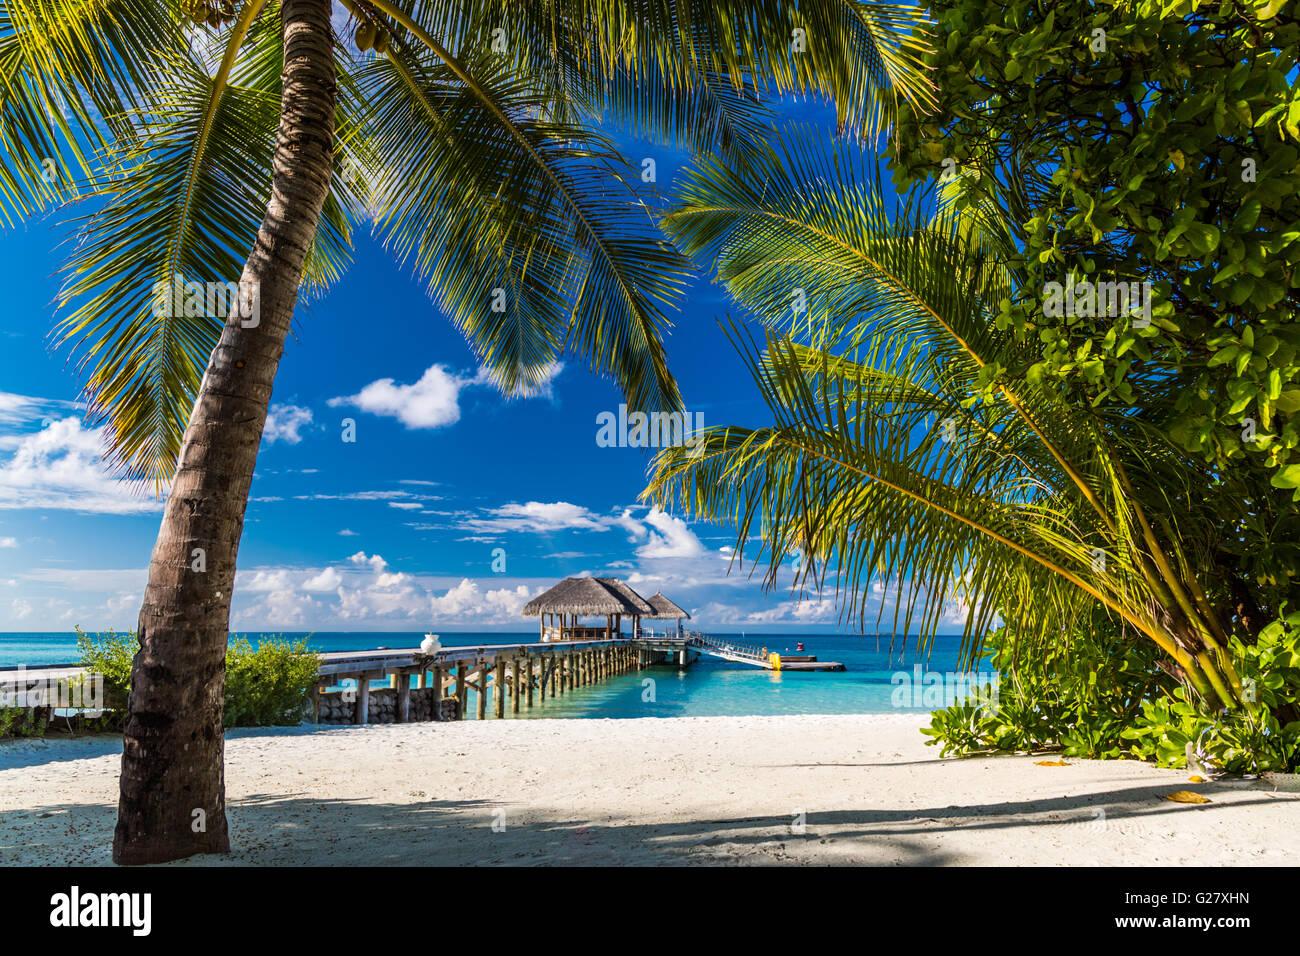 Beautiful tropical beach, Maldives - Stock Image